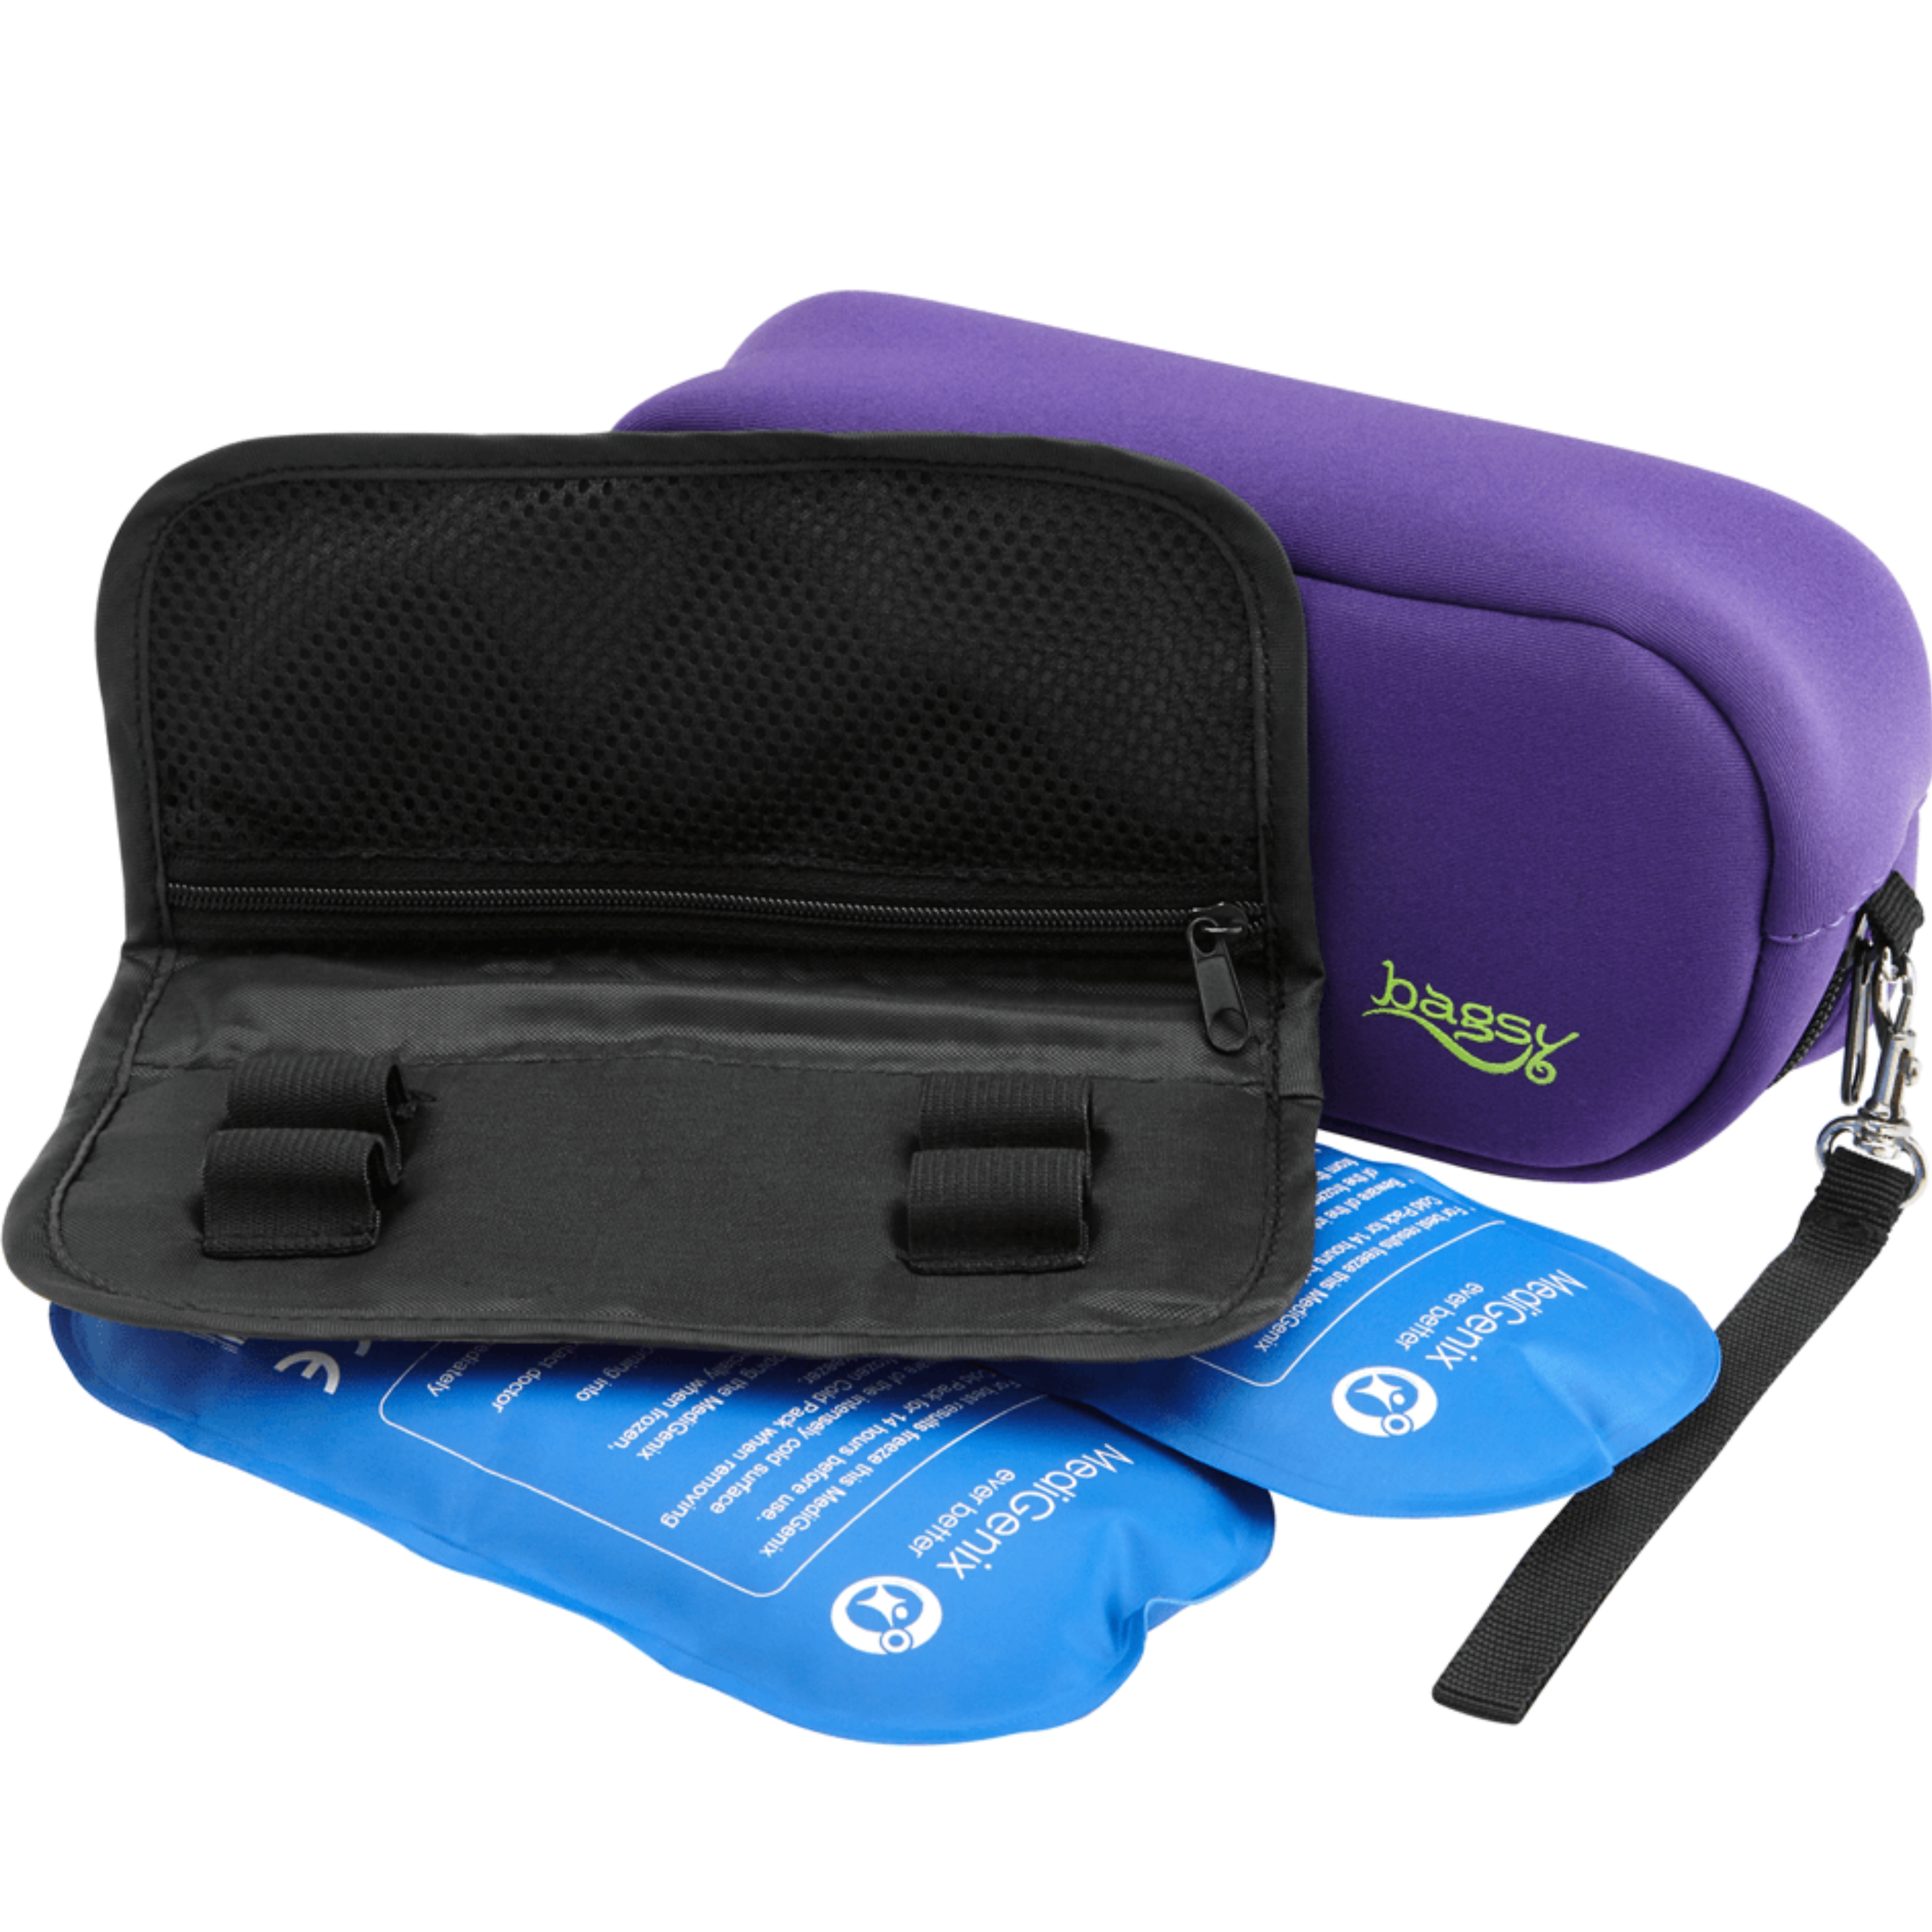 Medigenix Bagsy Insulin & Medicine Carry Case (Purple) | Transporting Bag | MGX012P